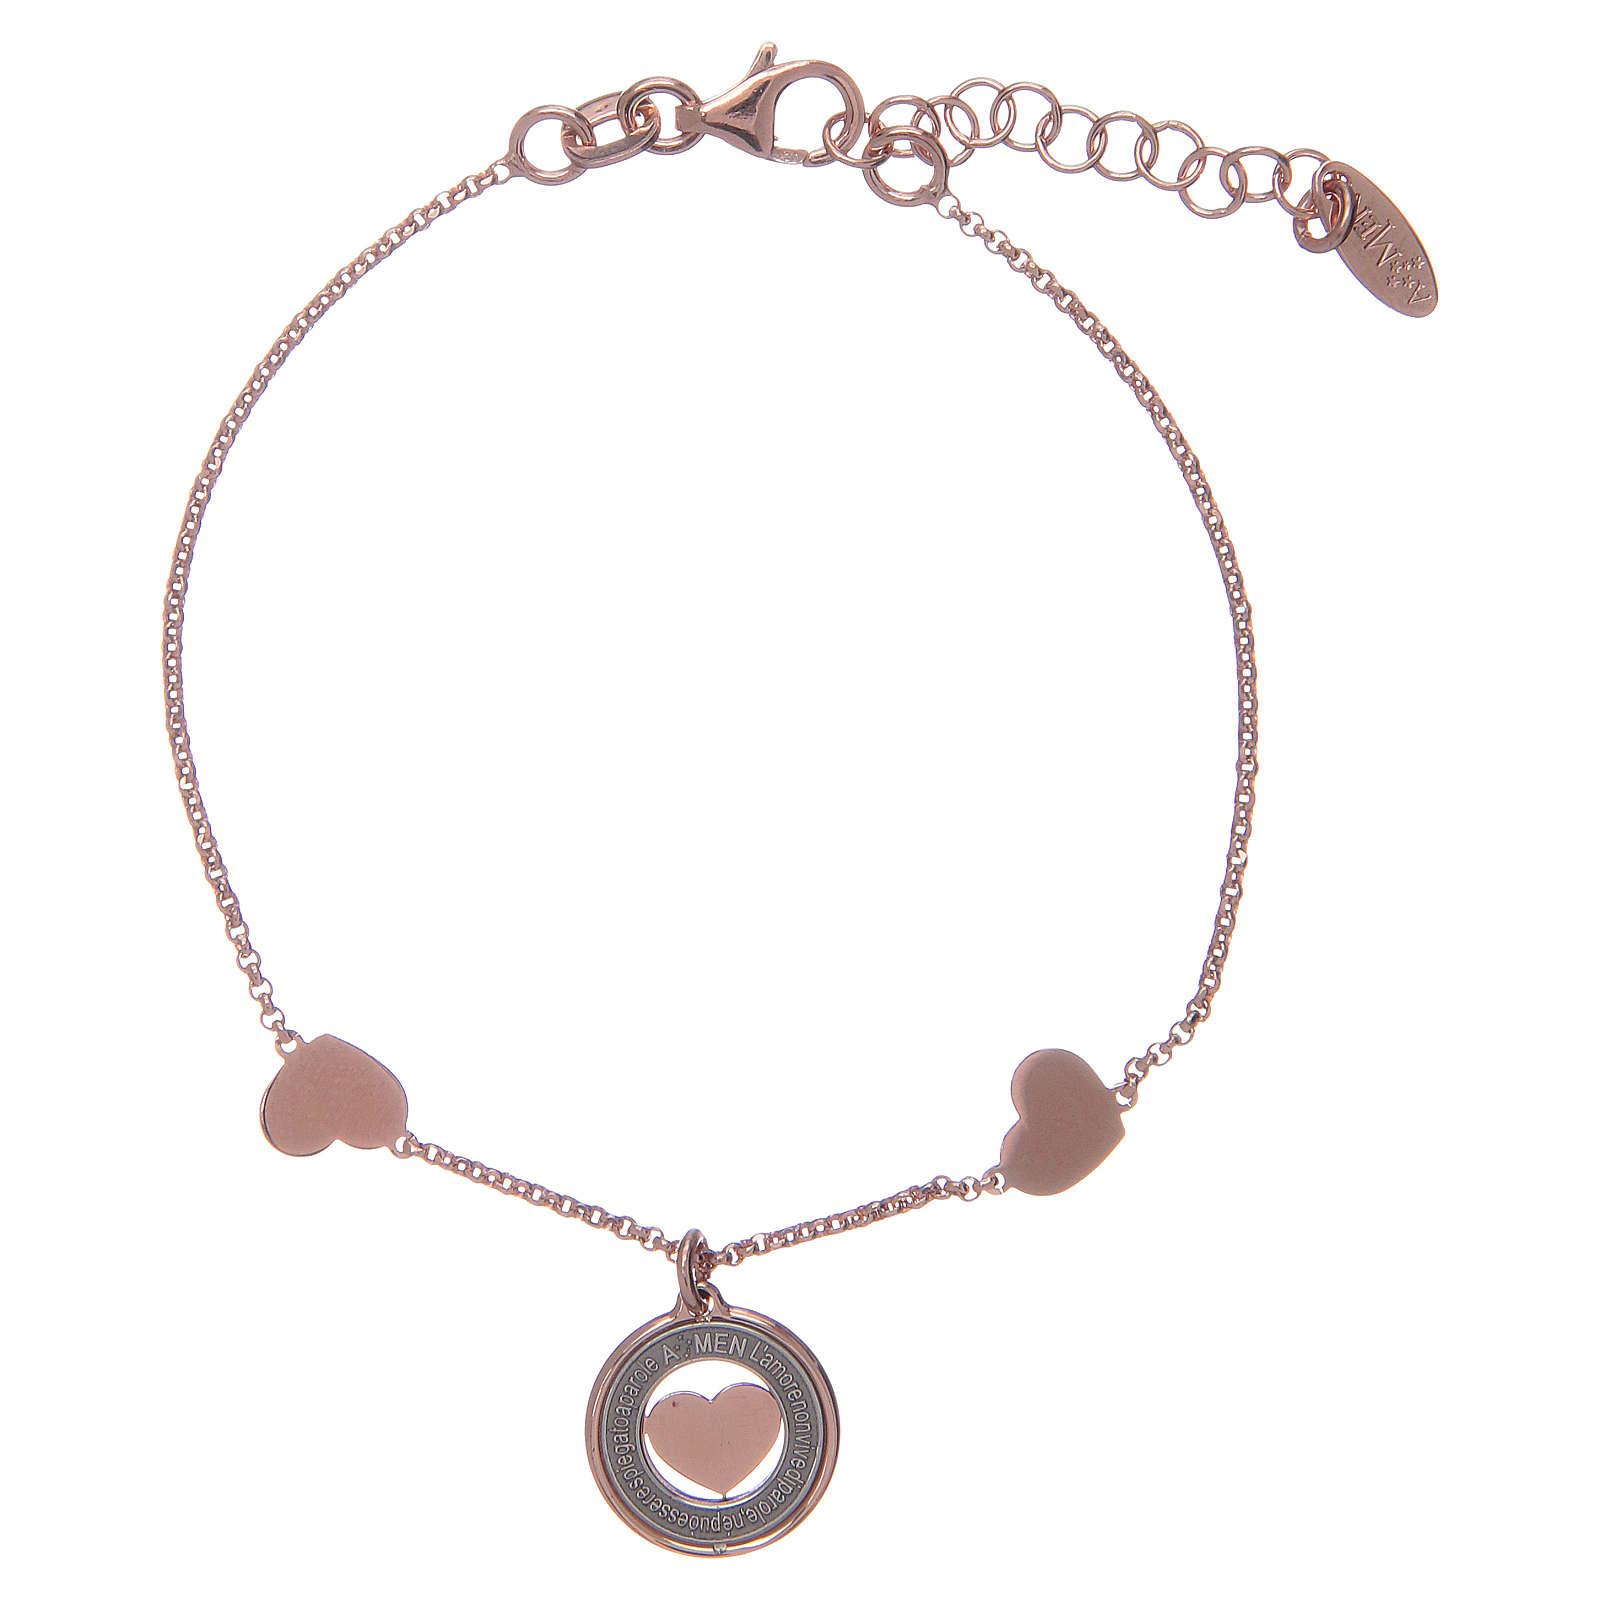 Amen bracelet in pink silver with hearts 4